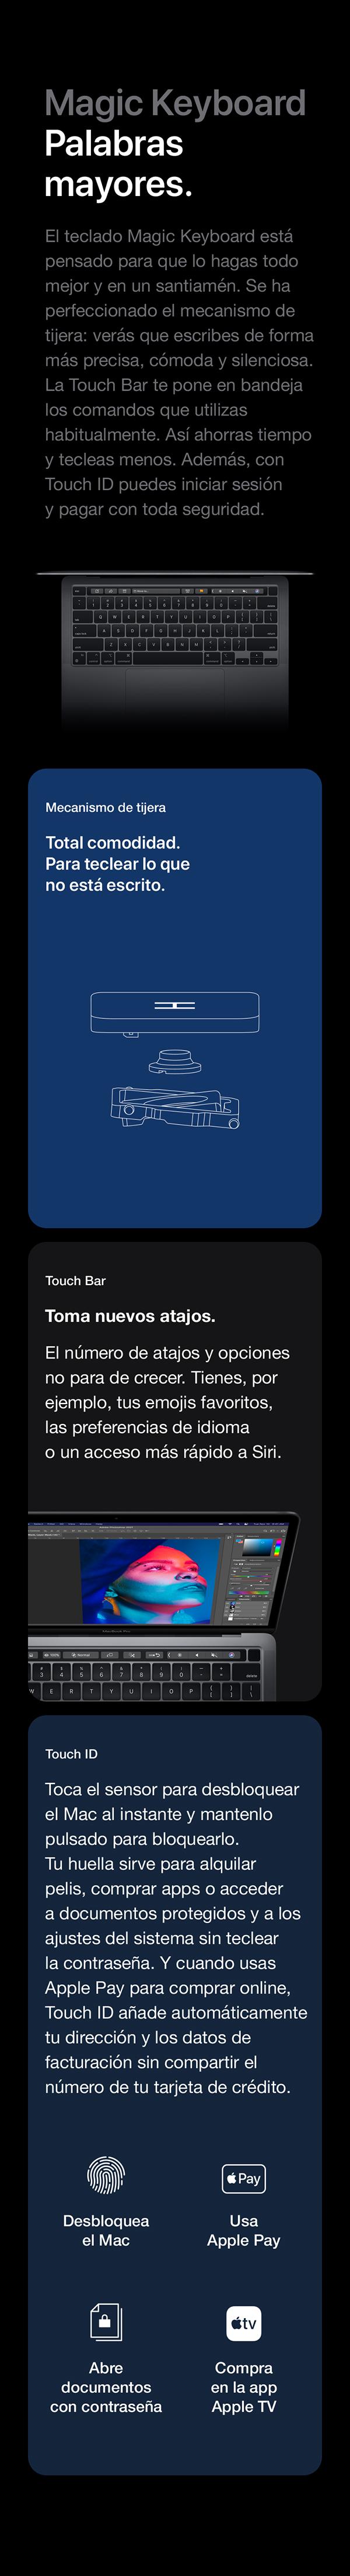 MacBook Pro_pic6